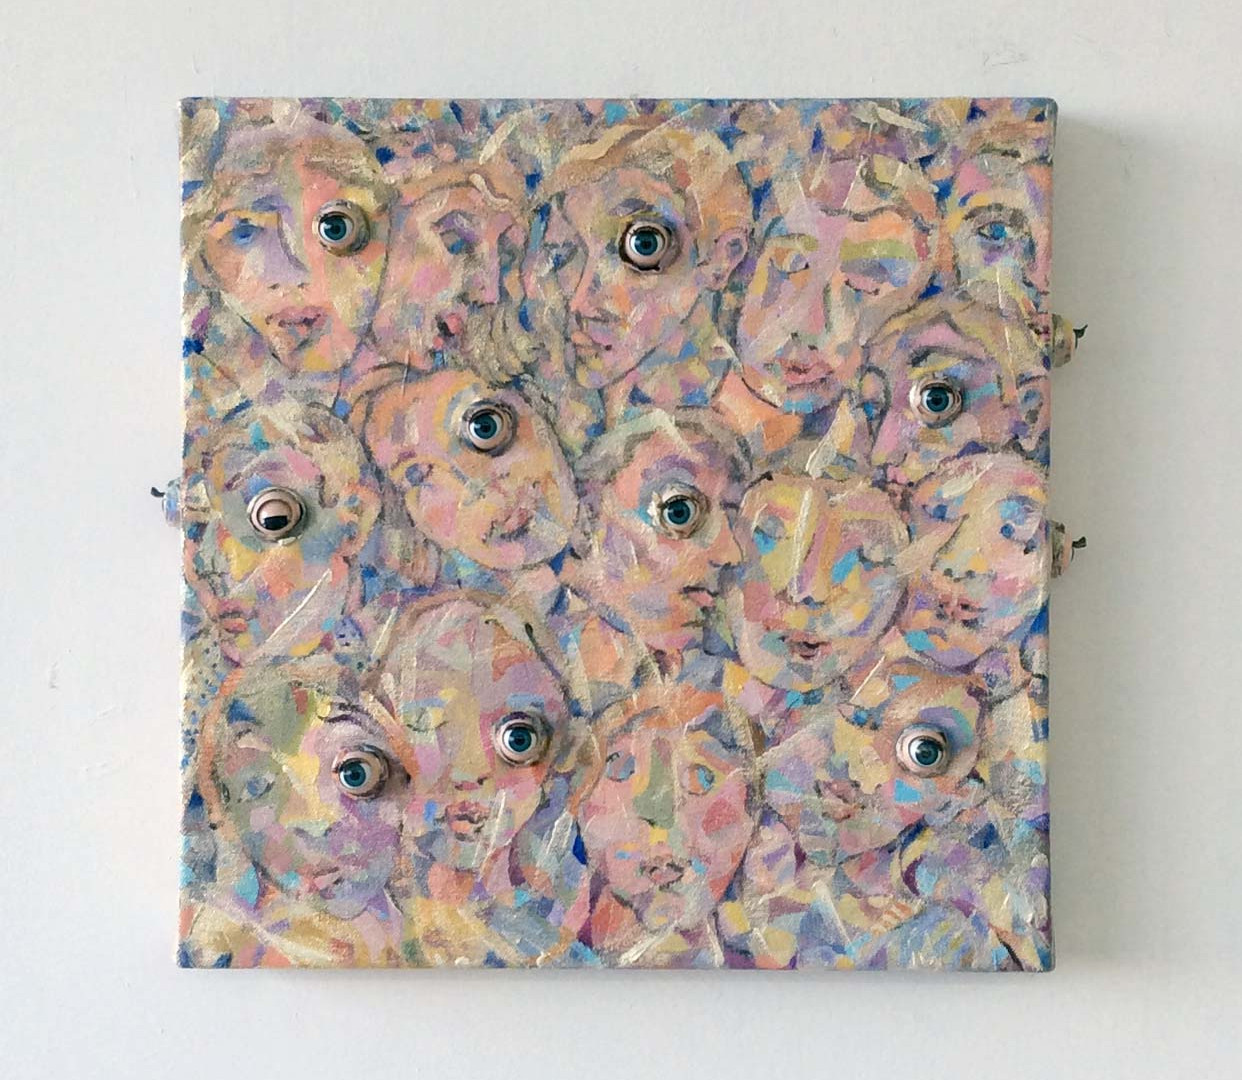 Faced with Eyes, Seg10 no1